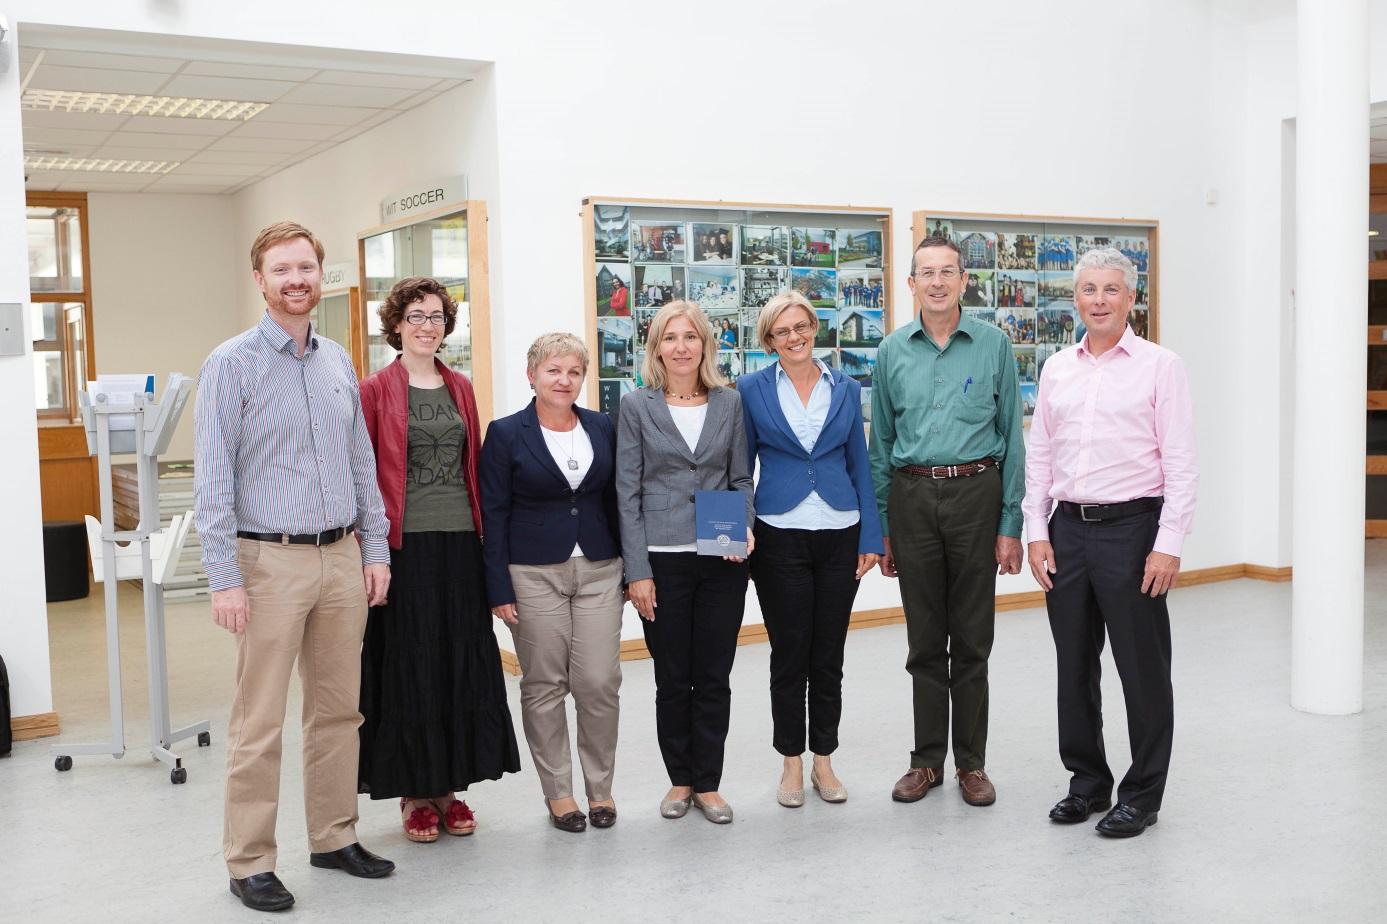 Derek Sinnott, Susan Gallagher, Renata Kozik, Agnieszka Leśniak, Edyta Plebankiewicz, John Carney & Ken Thomas